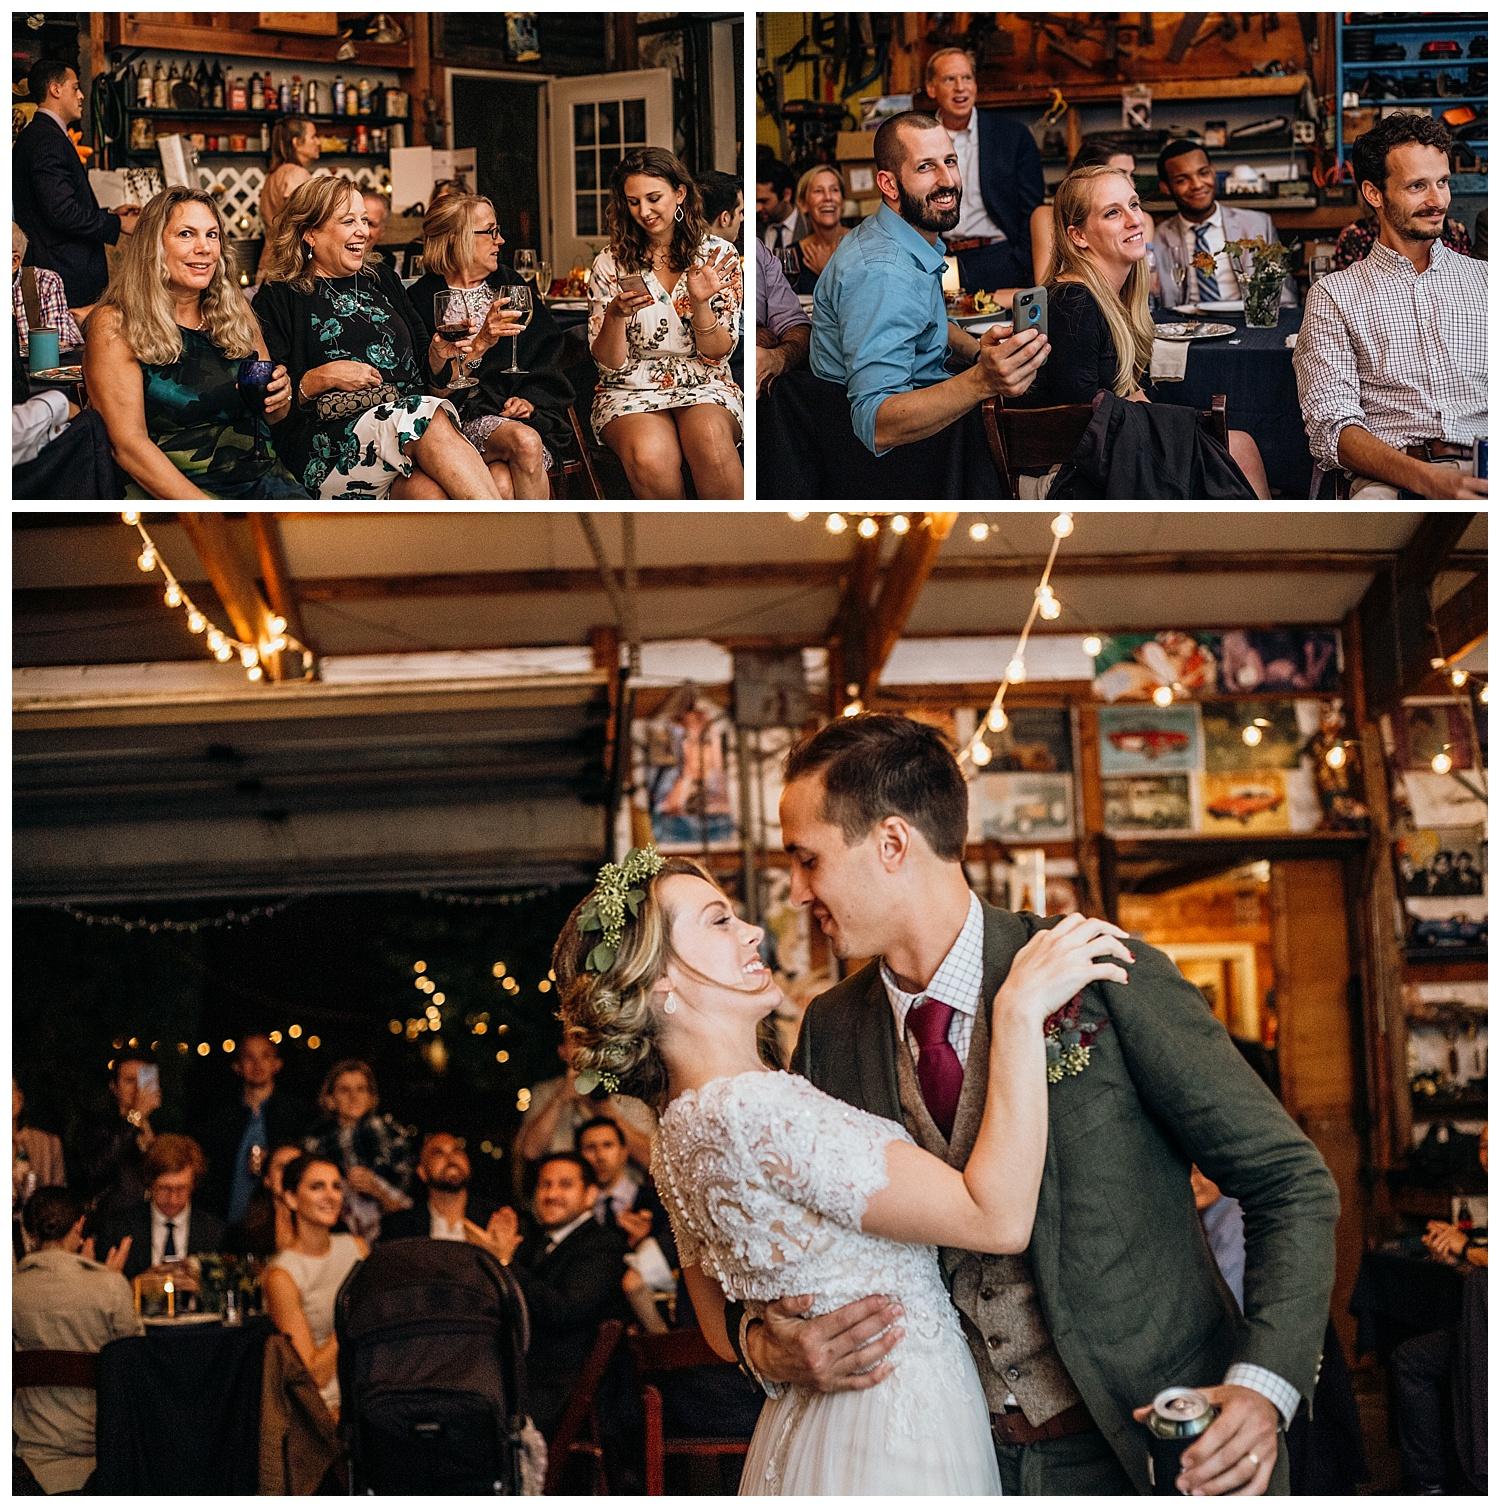 Huie_Wedding_Apollo_Fields_Ramsey_NJ_034.jpg